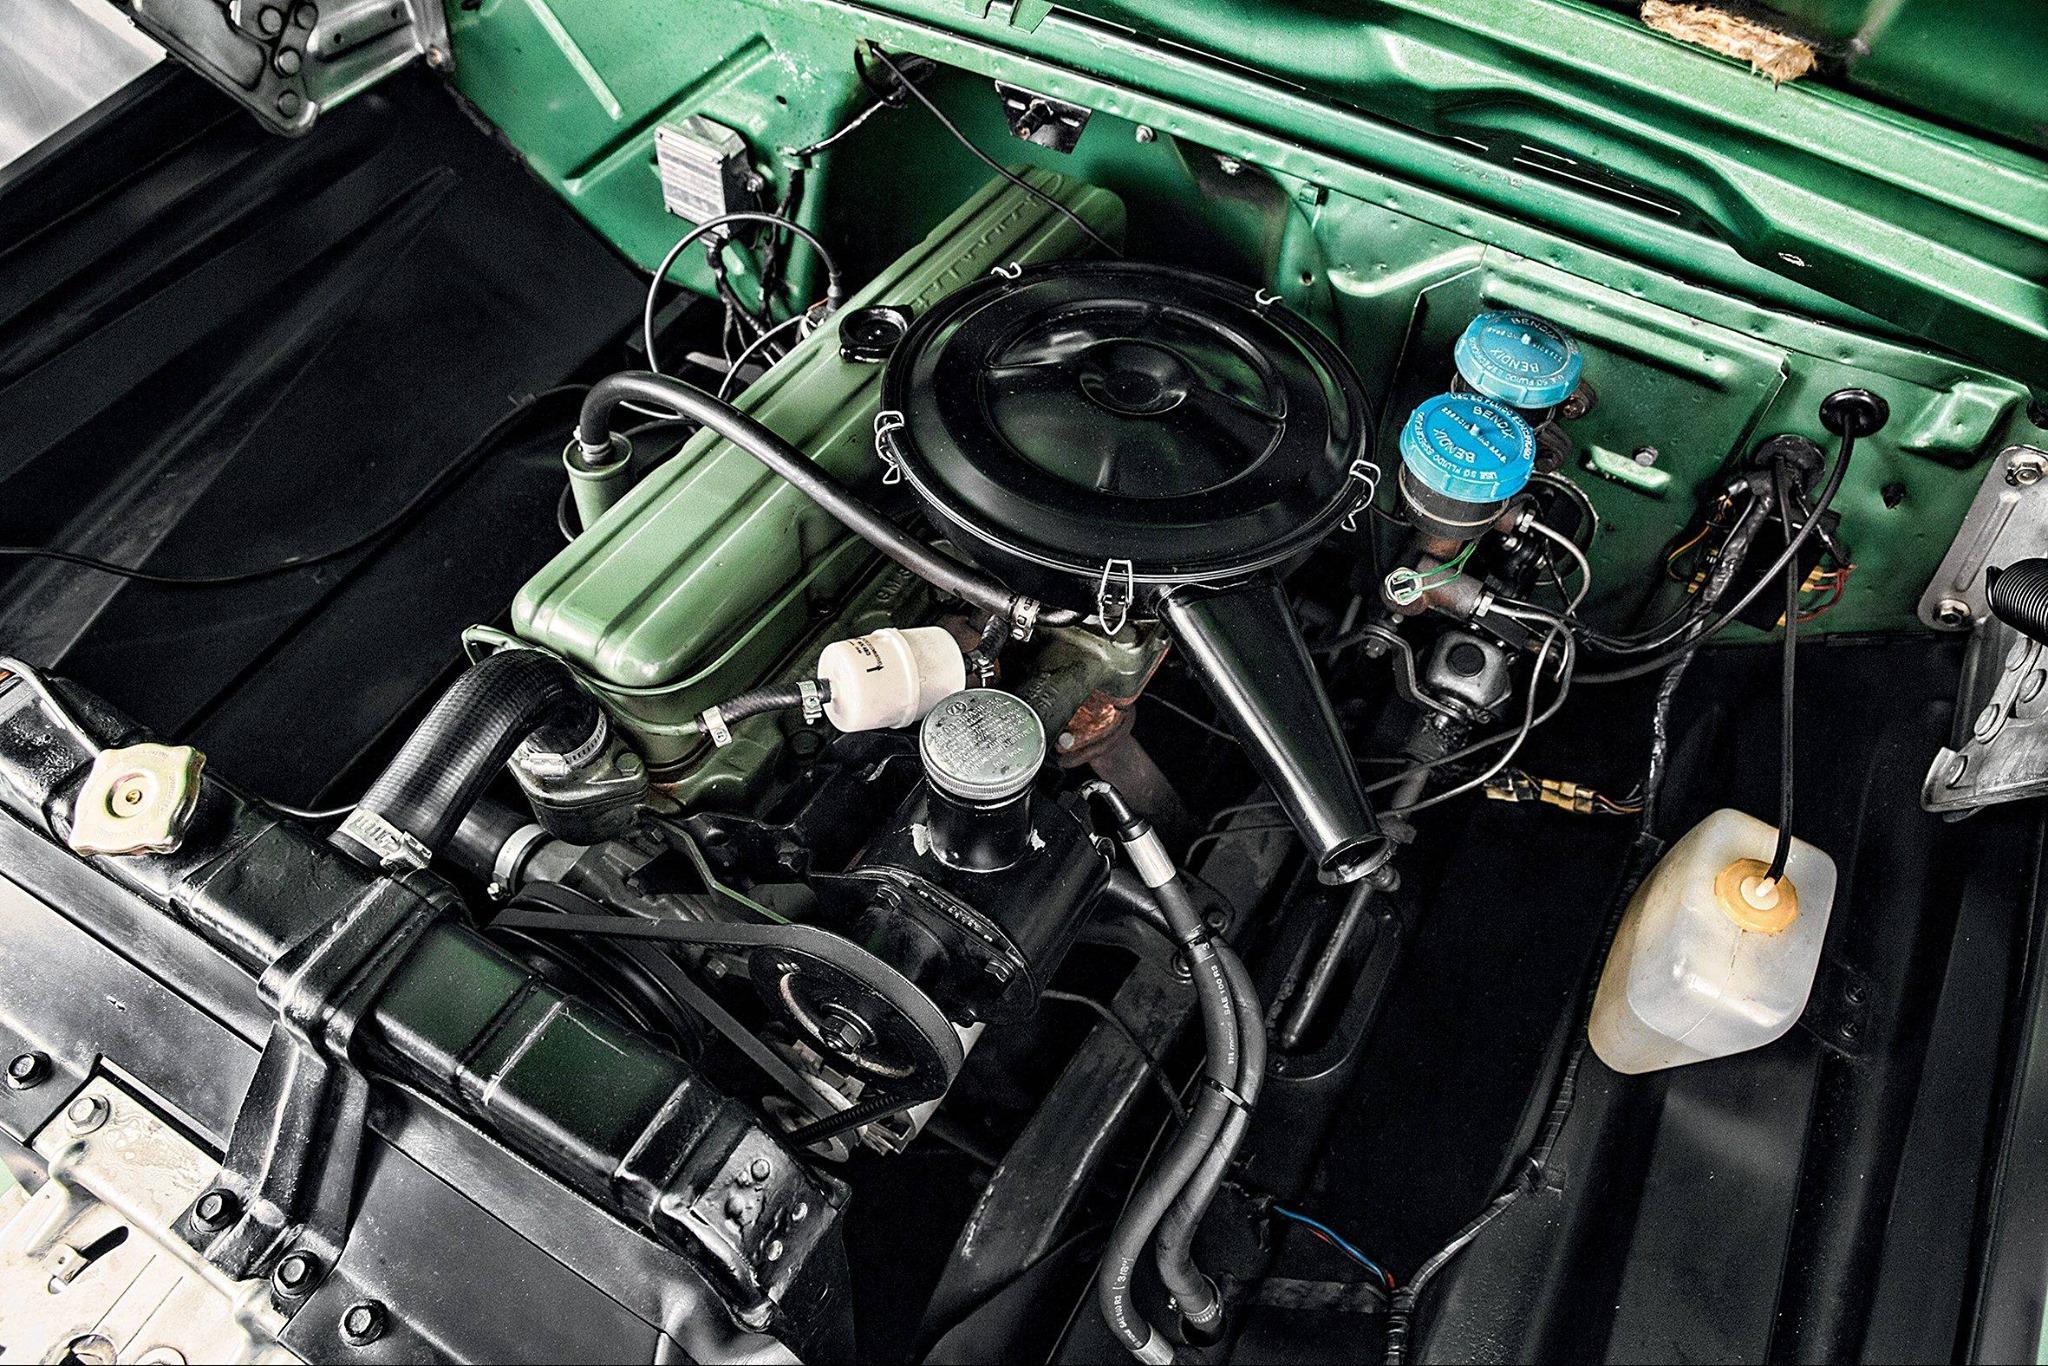 Chevrolet-Veraneio--1964--1994-C-1416-7